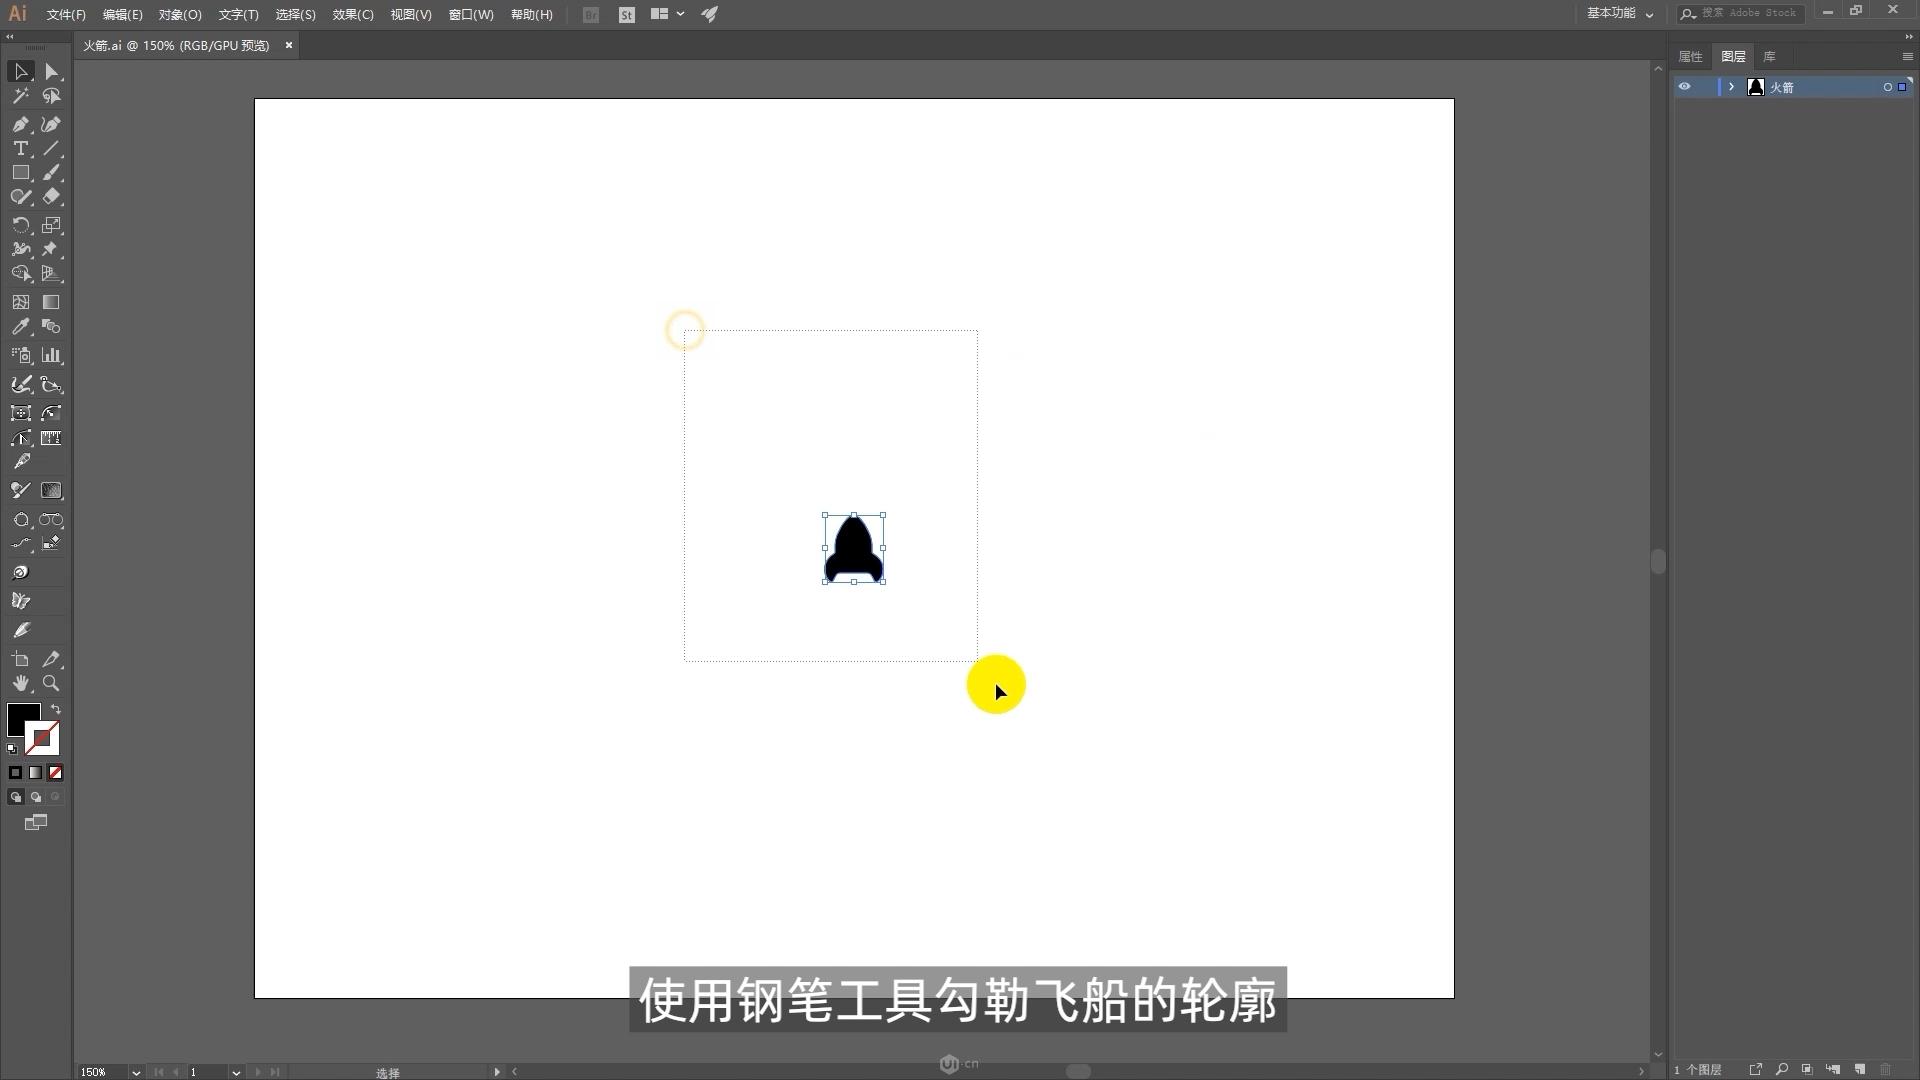 AE如何制作简单的太空旅行MG动画(1)